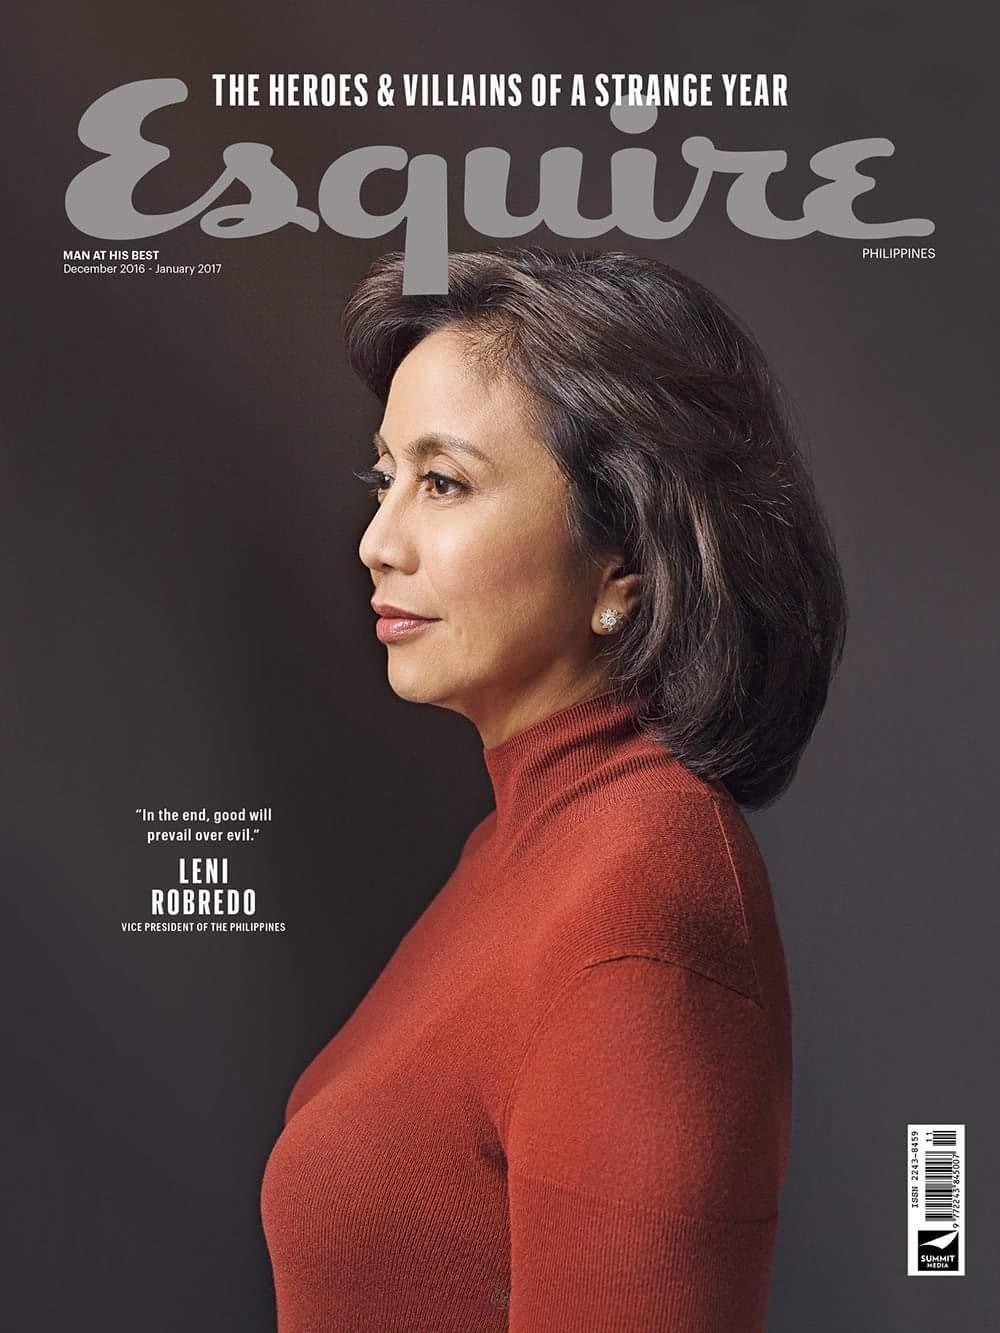 VP Leni Robredo on the Cover of Esquire